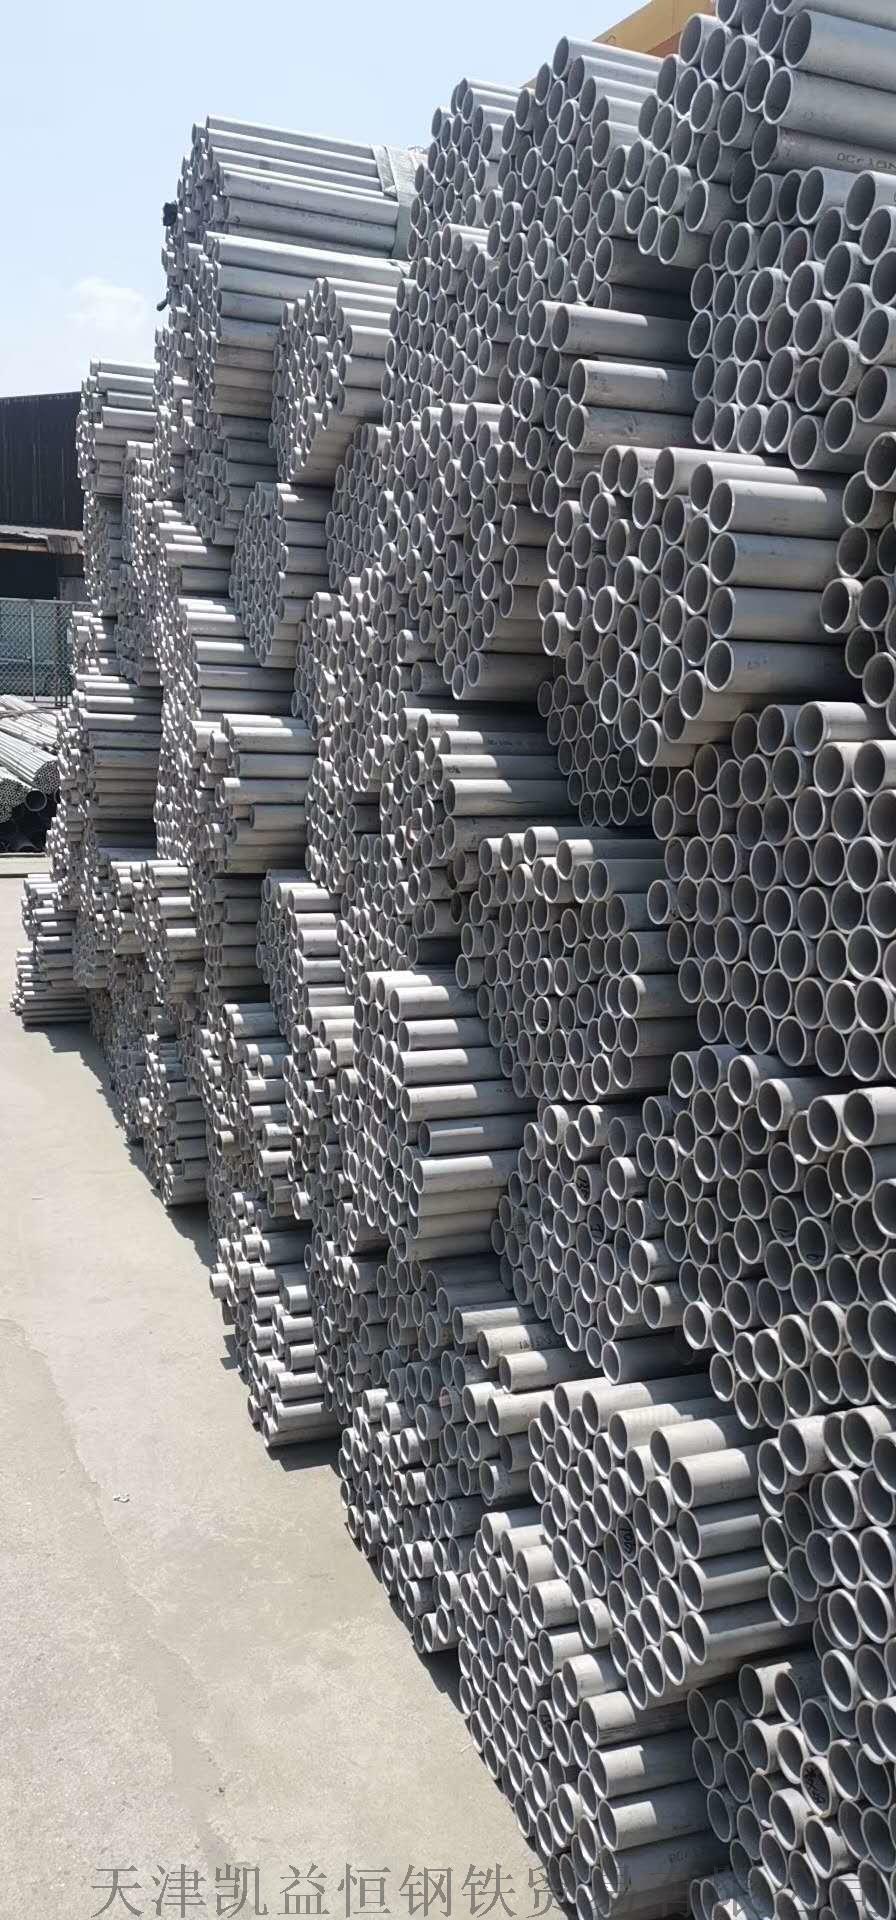 TP304不锈钢焊管厂